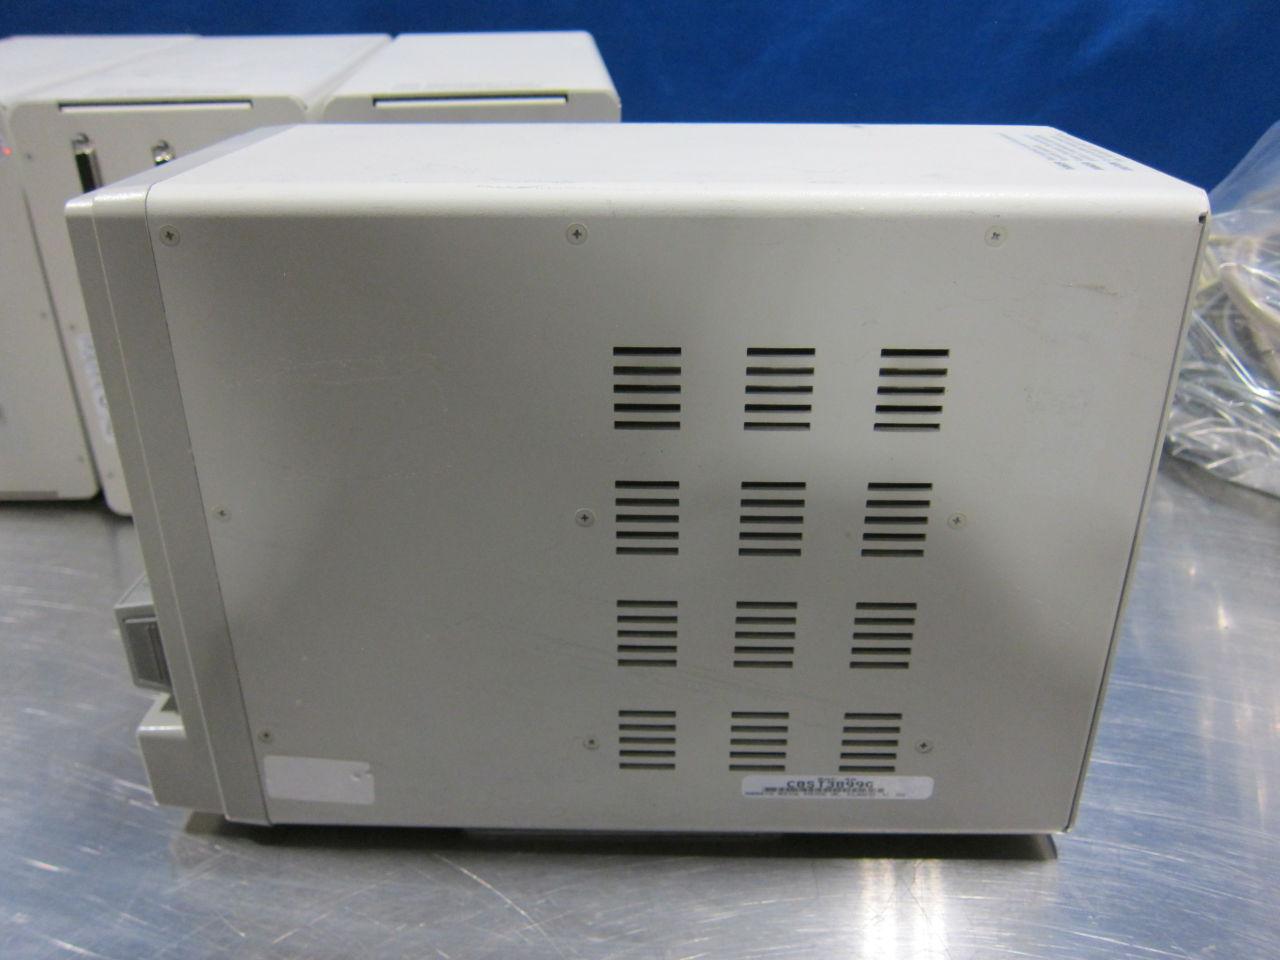 GE Tram-Rac 4 Module